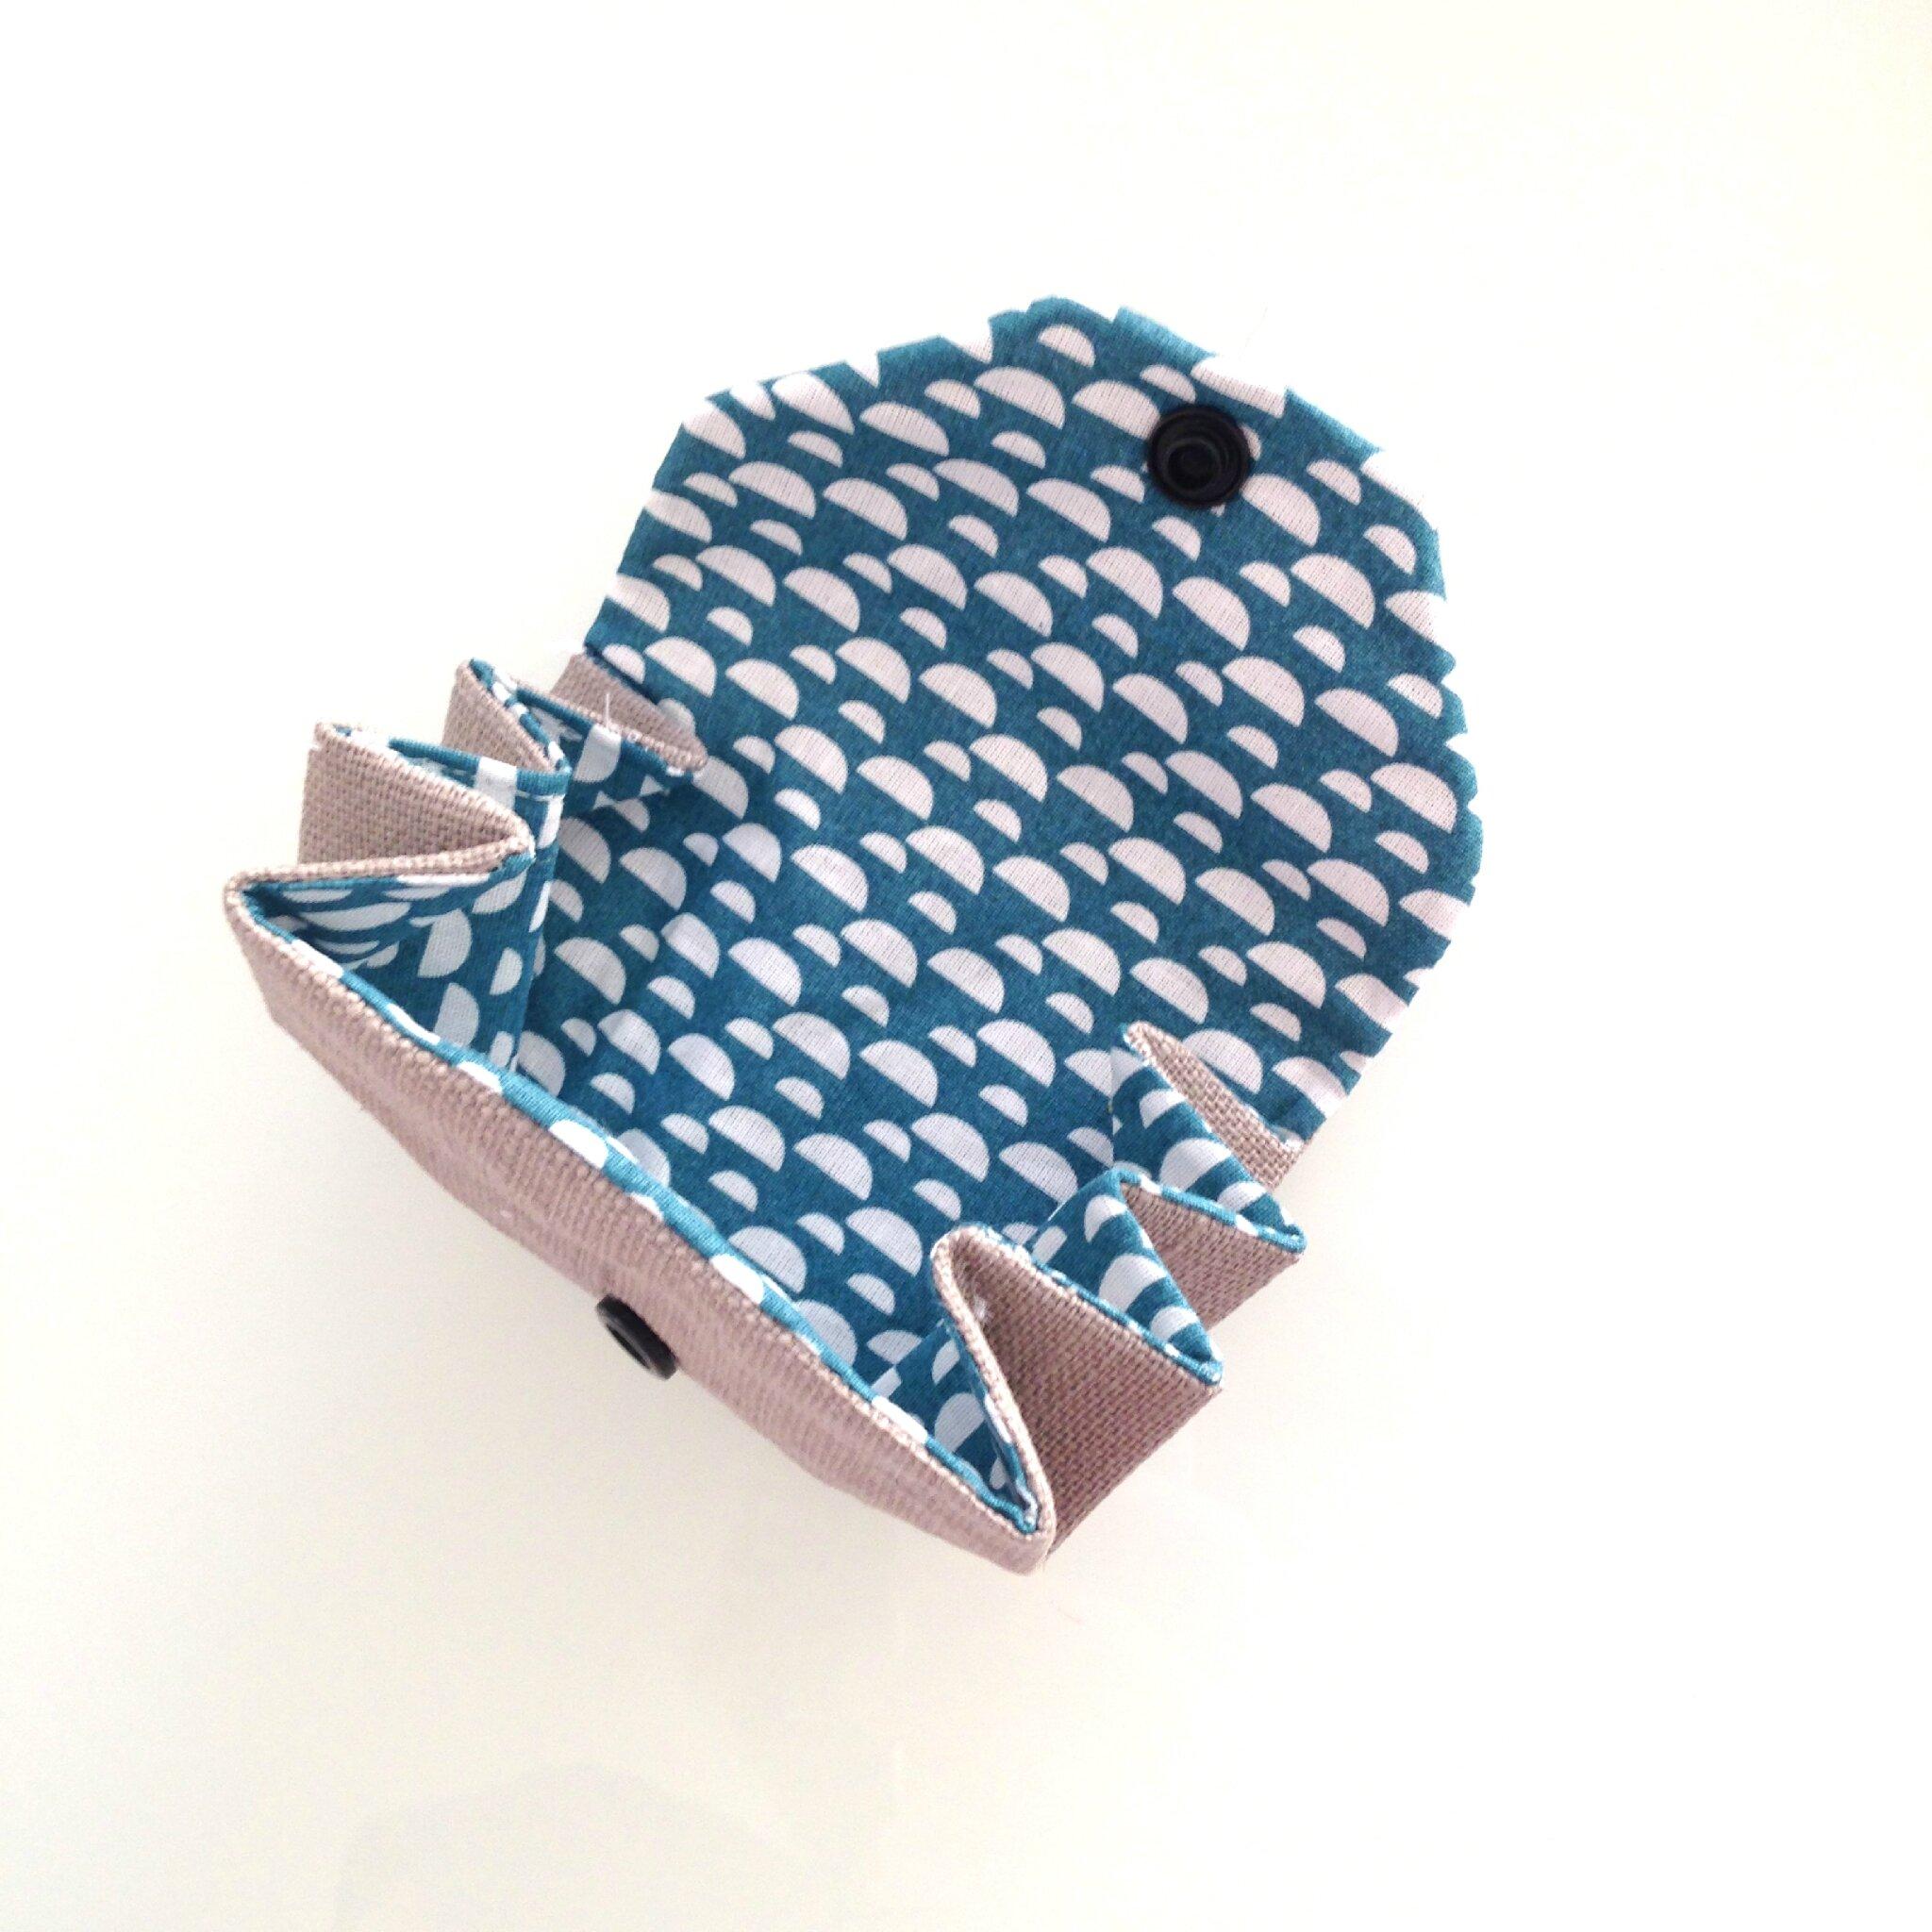 tuto porte monnaie mise jour du gabarit lili ludi. Black Bedroom Furniture Sets. Home Design Ideas